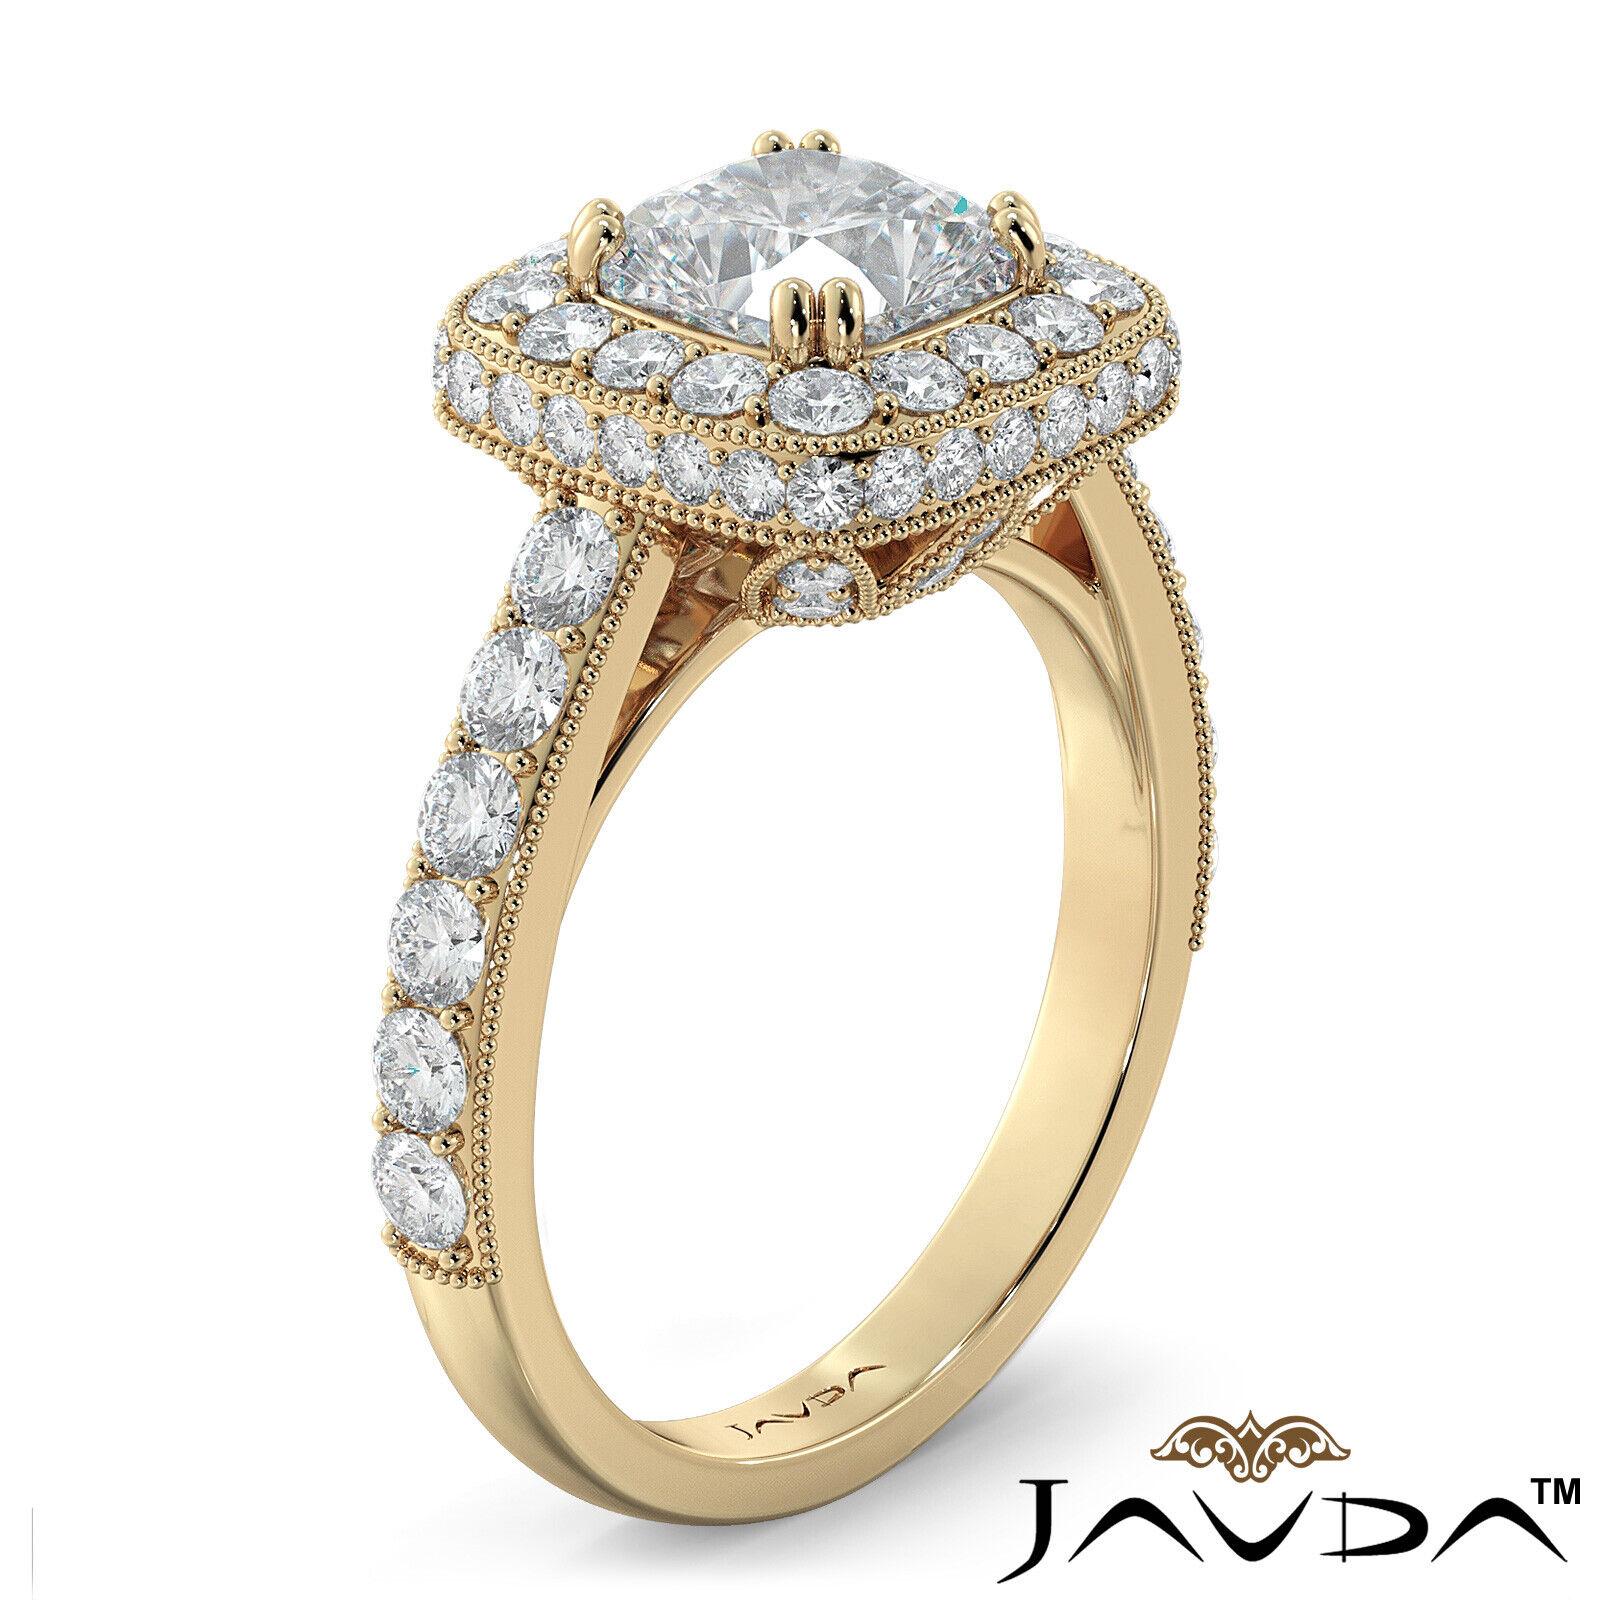 2.12ctw Milgrain Floral Basket Cushion Diamond Engagement Ring GIA I-SI2 W Gold 8